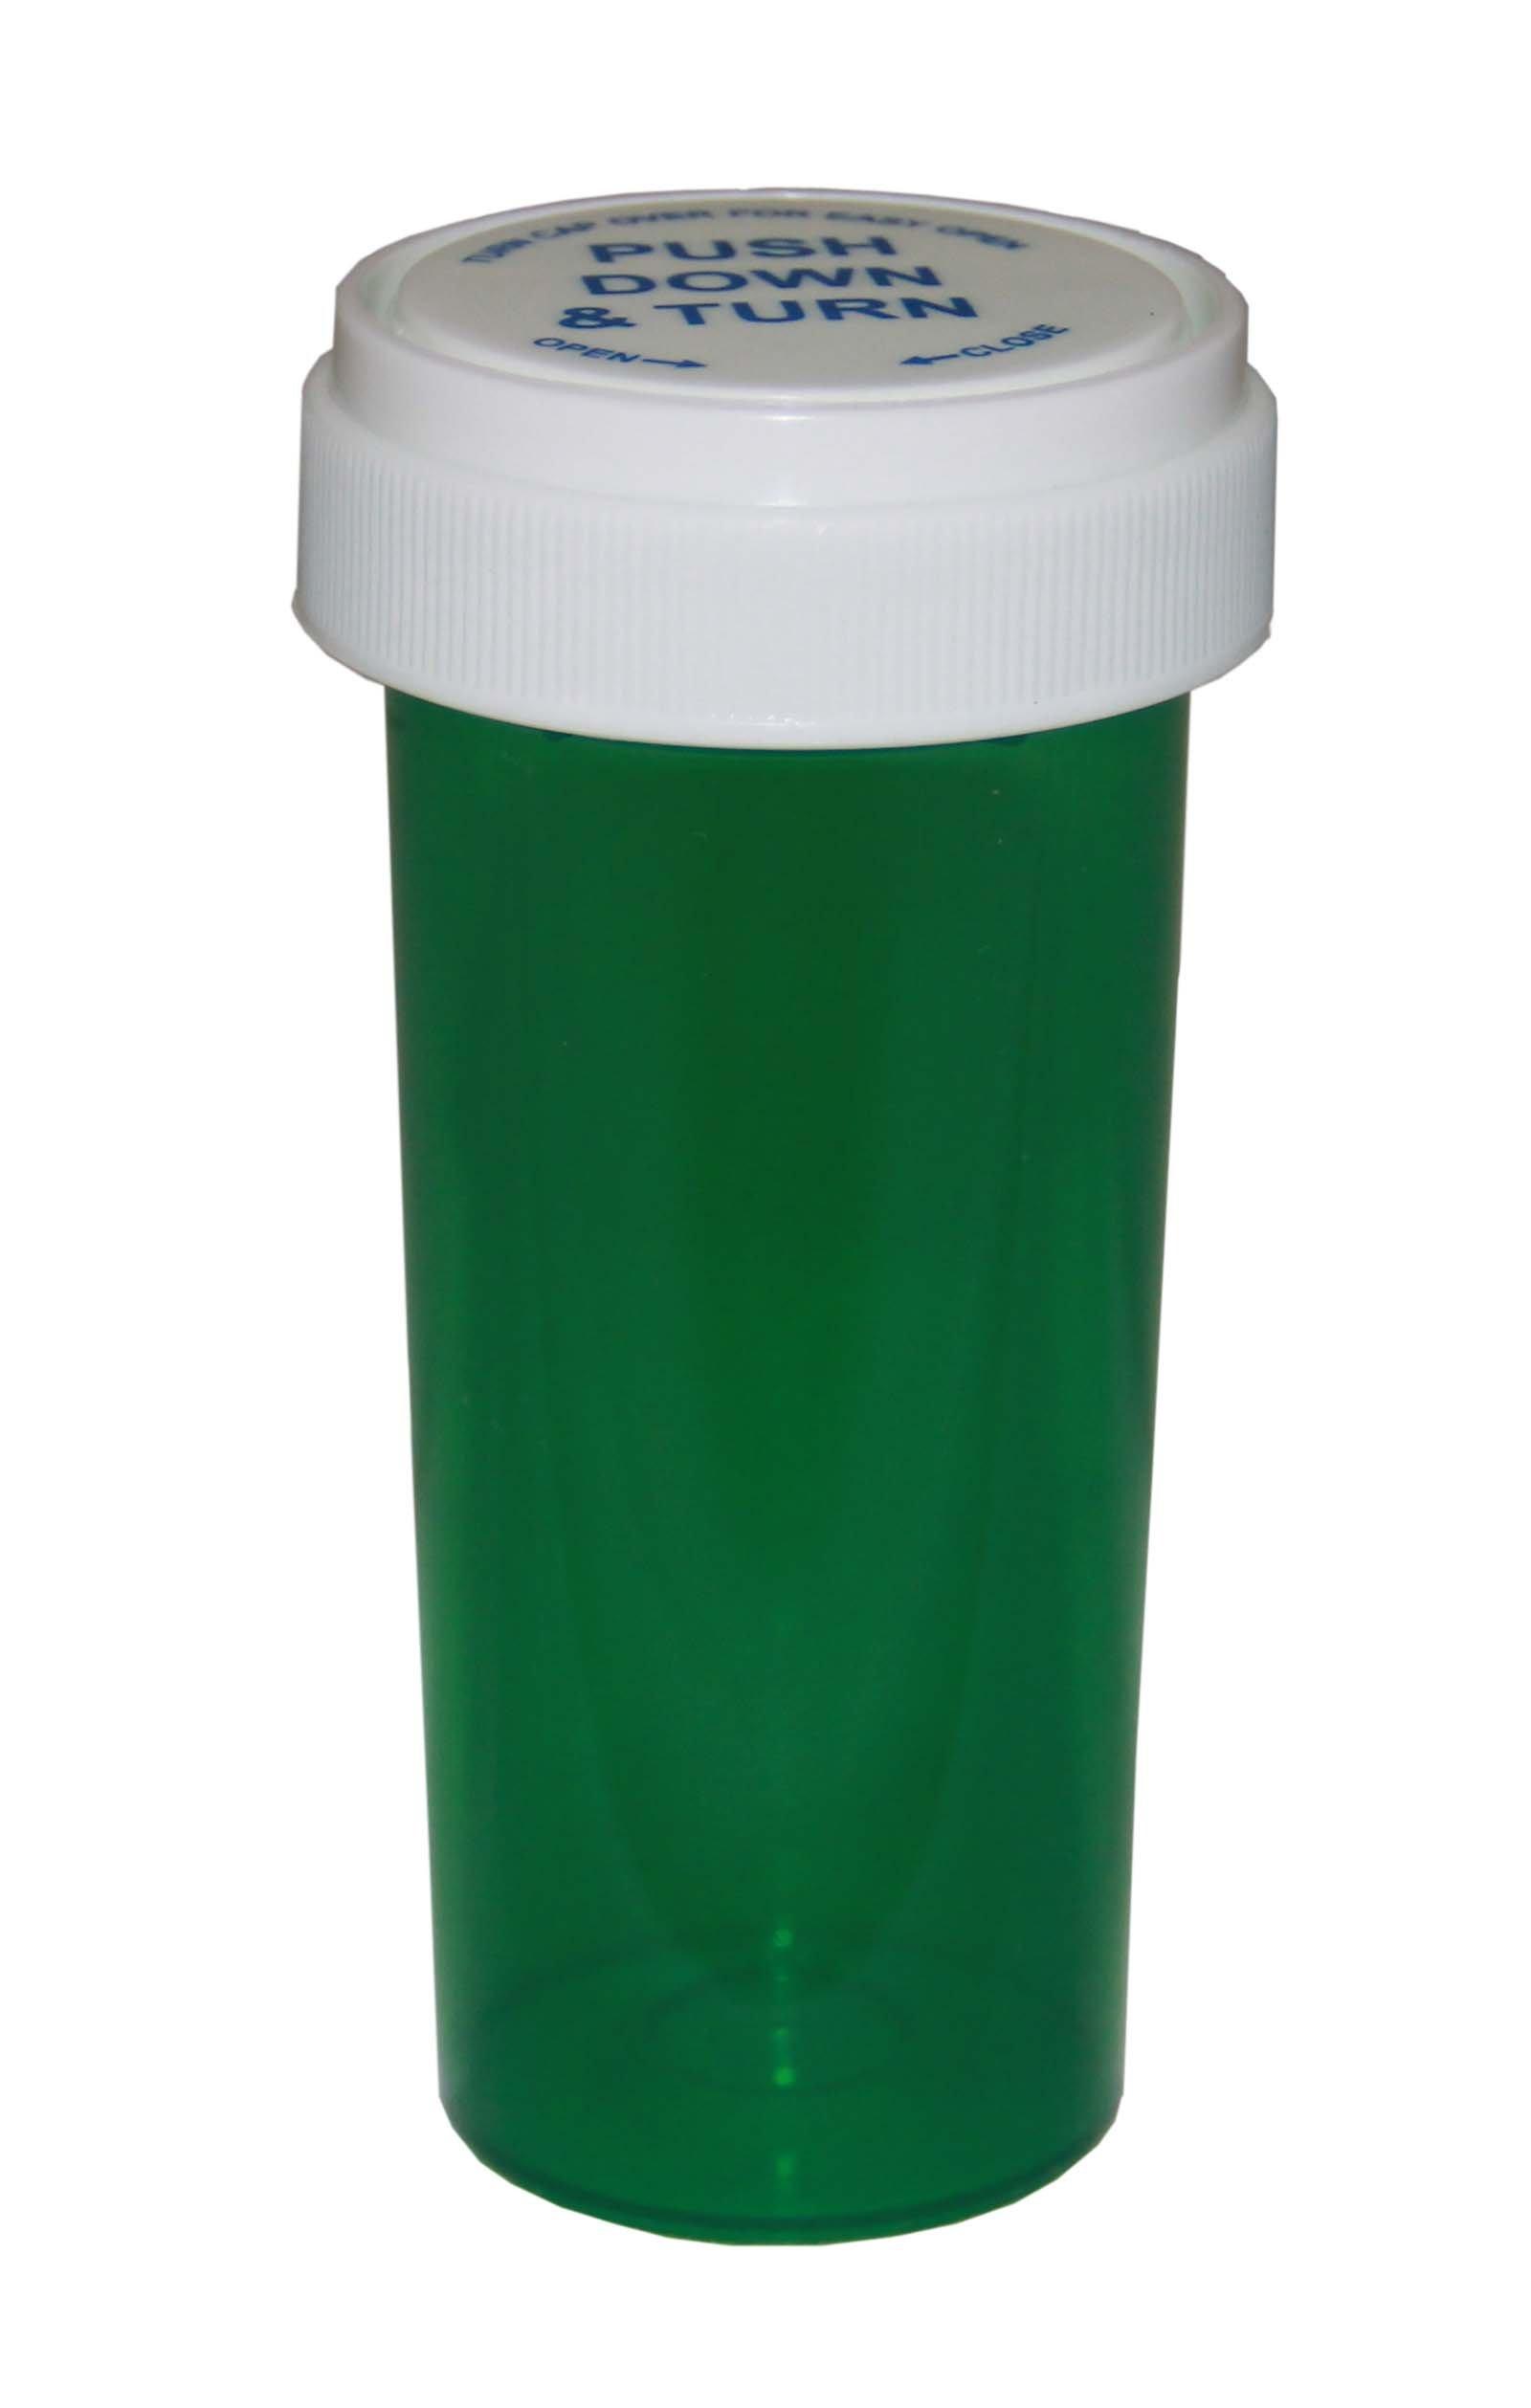 Prescription Pharmacy Vials - Green Child Resistant Medicine Bottle -40 Dram- Reversible Caps-Pack of 130 -Medicine & Pill Container, Pharmacy Bottle, Pharmacy Container, Plastic Container